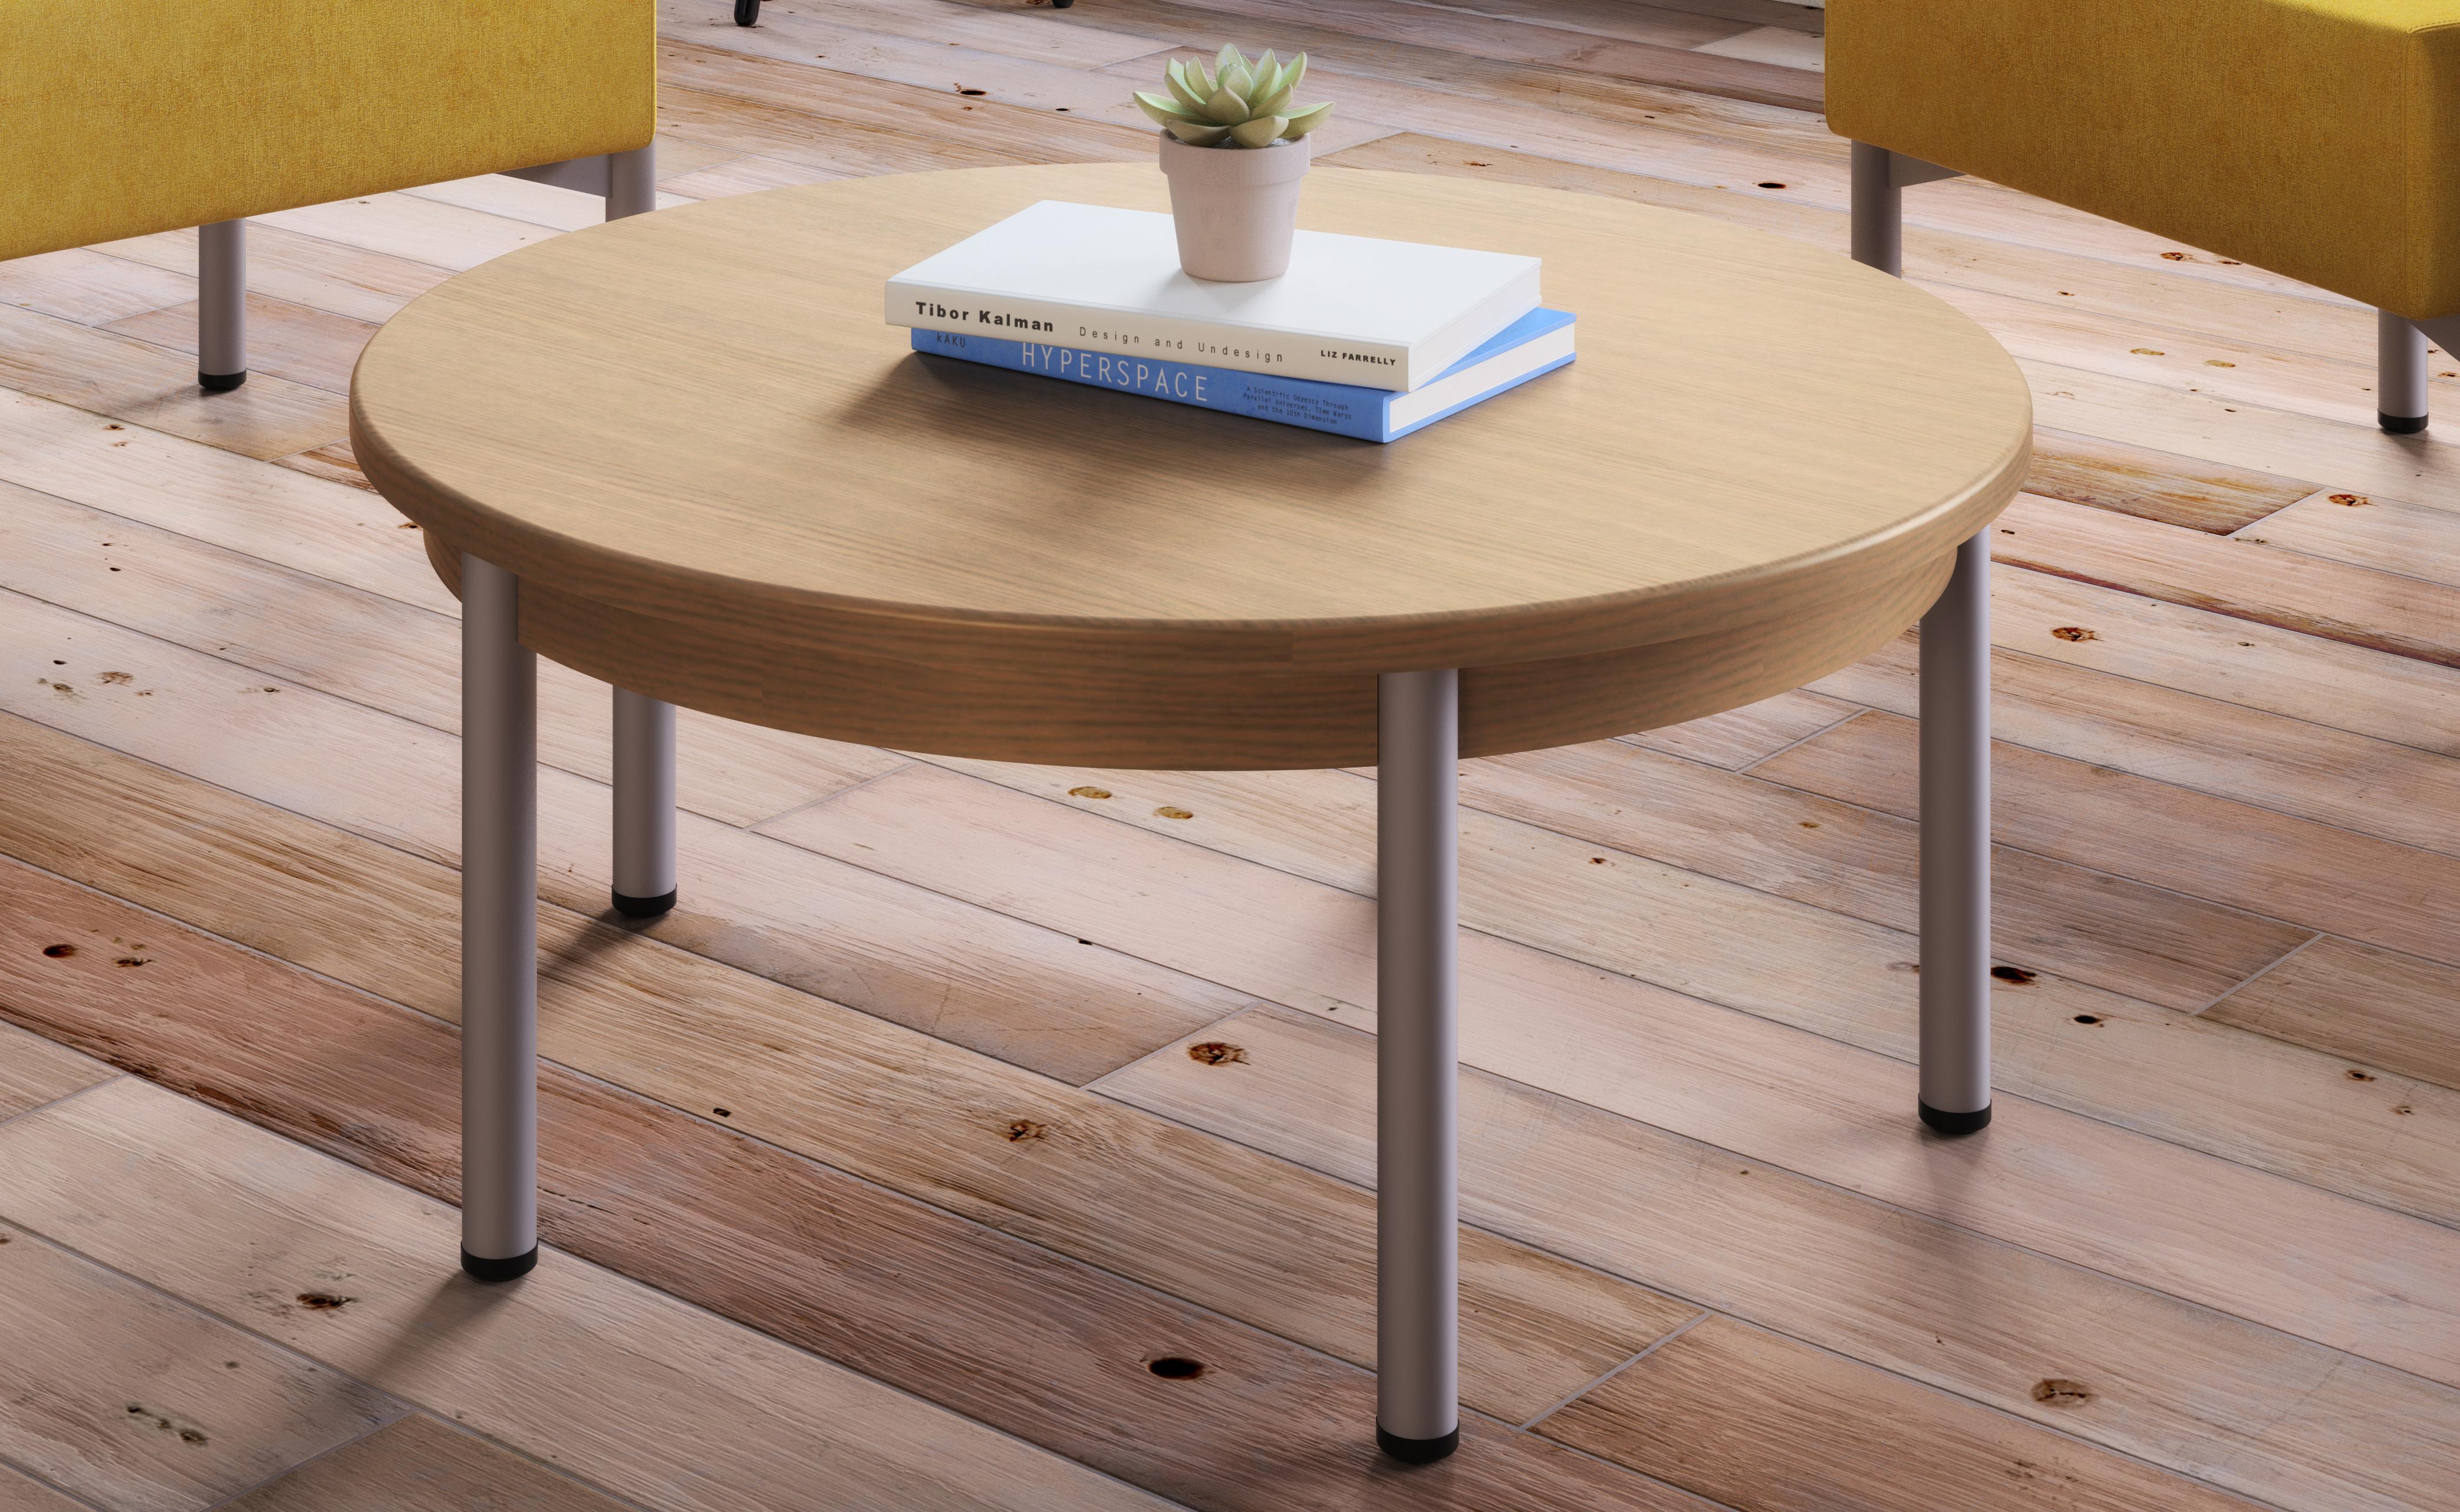 Lôbi Tables